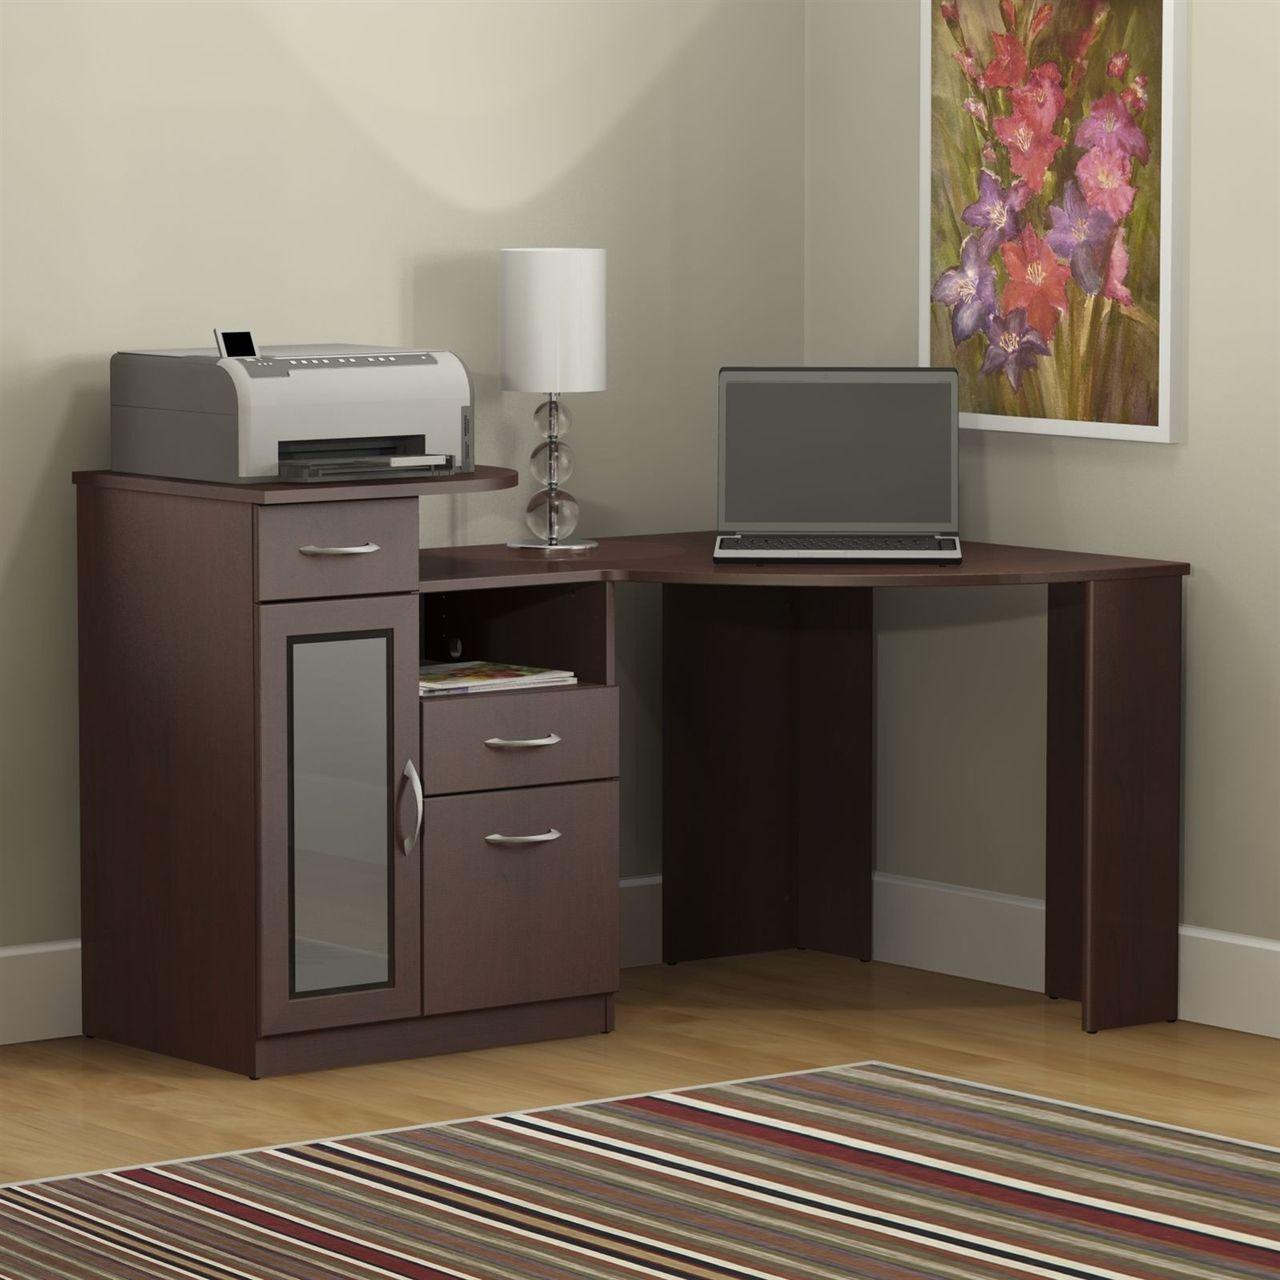 Medium Wood Finish Corner Computer Desk With Printer Shelf Corner Writing Desk Home Office Computer Desk Black Corner Computer Desk